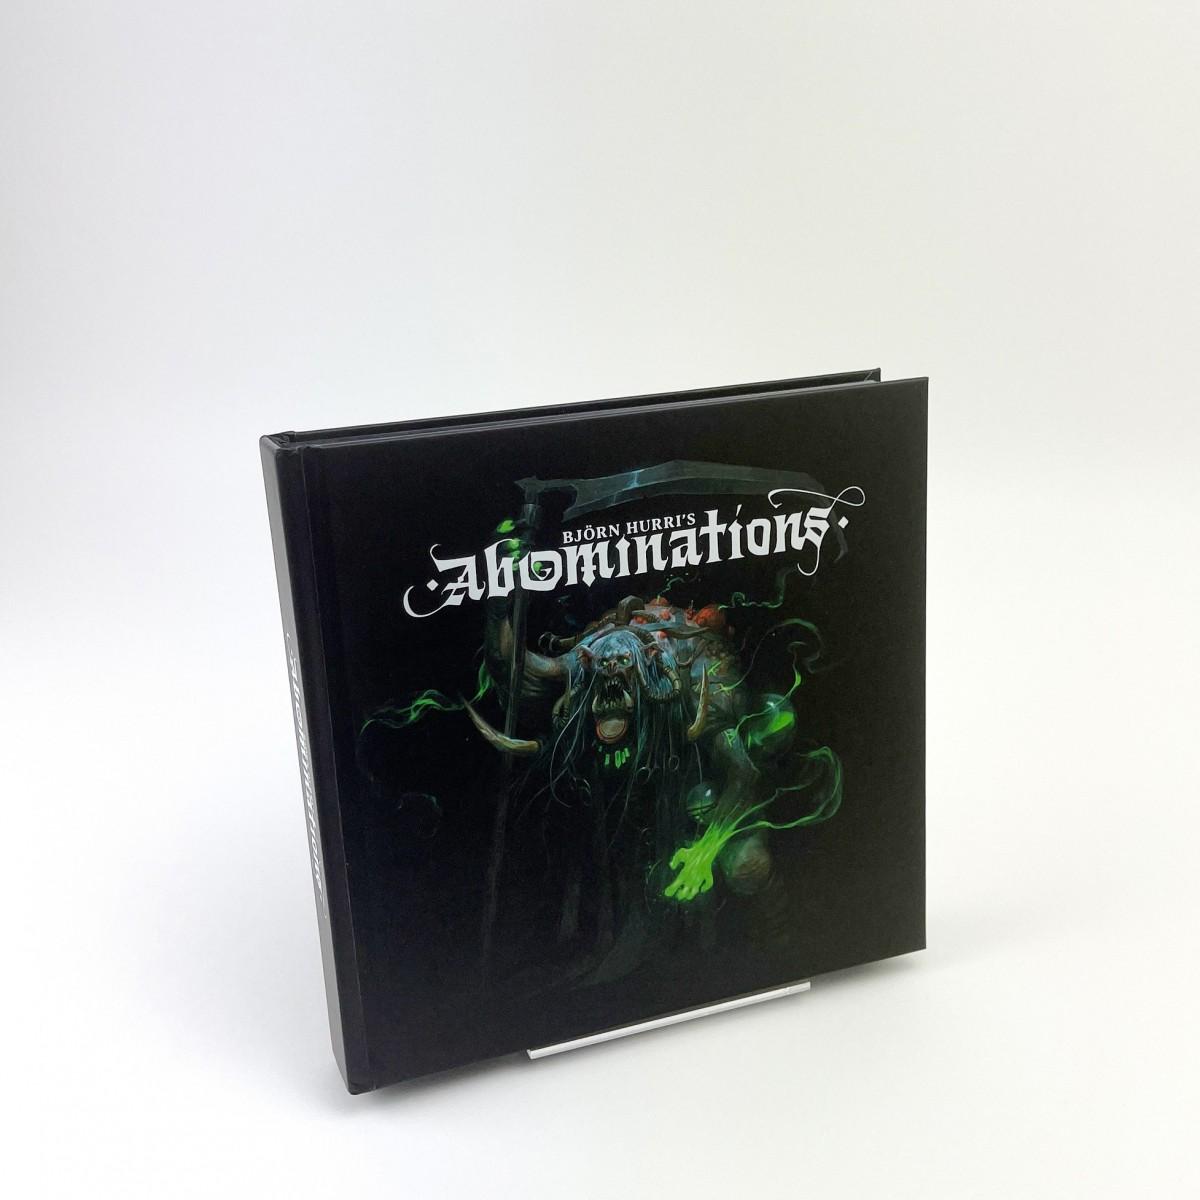 Björn Hurri - Abominations (précommande)